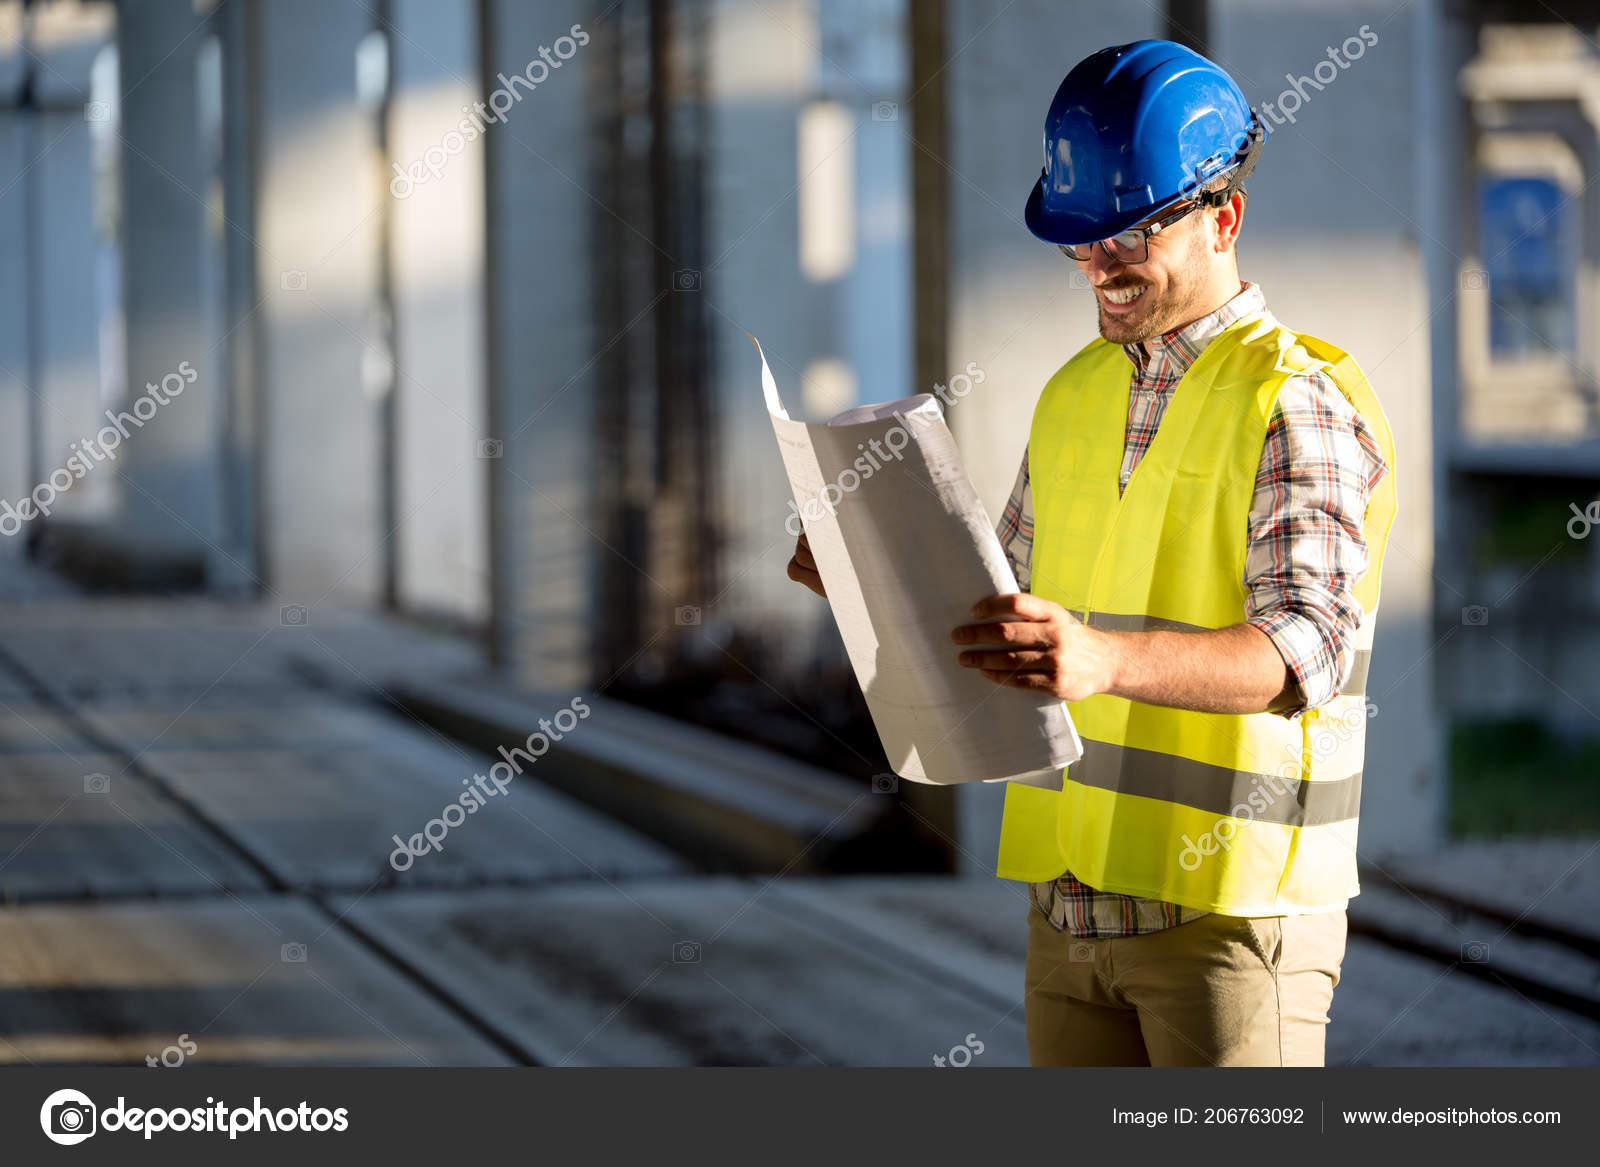 Construction foreman job site blueprint stock photo nd3000 construction foreman job site blueprint stock photo malvernweather Image collections